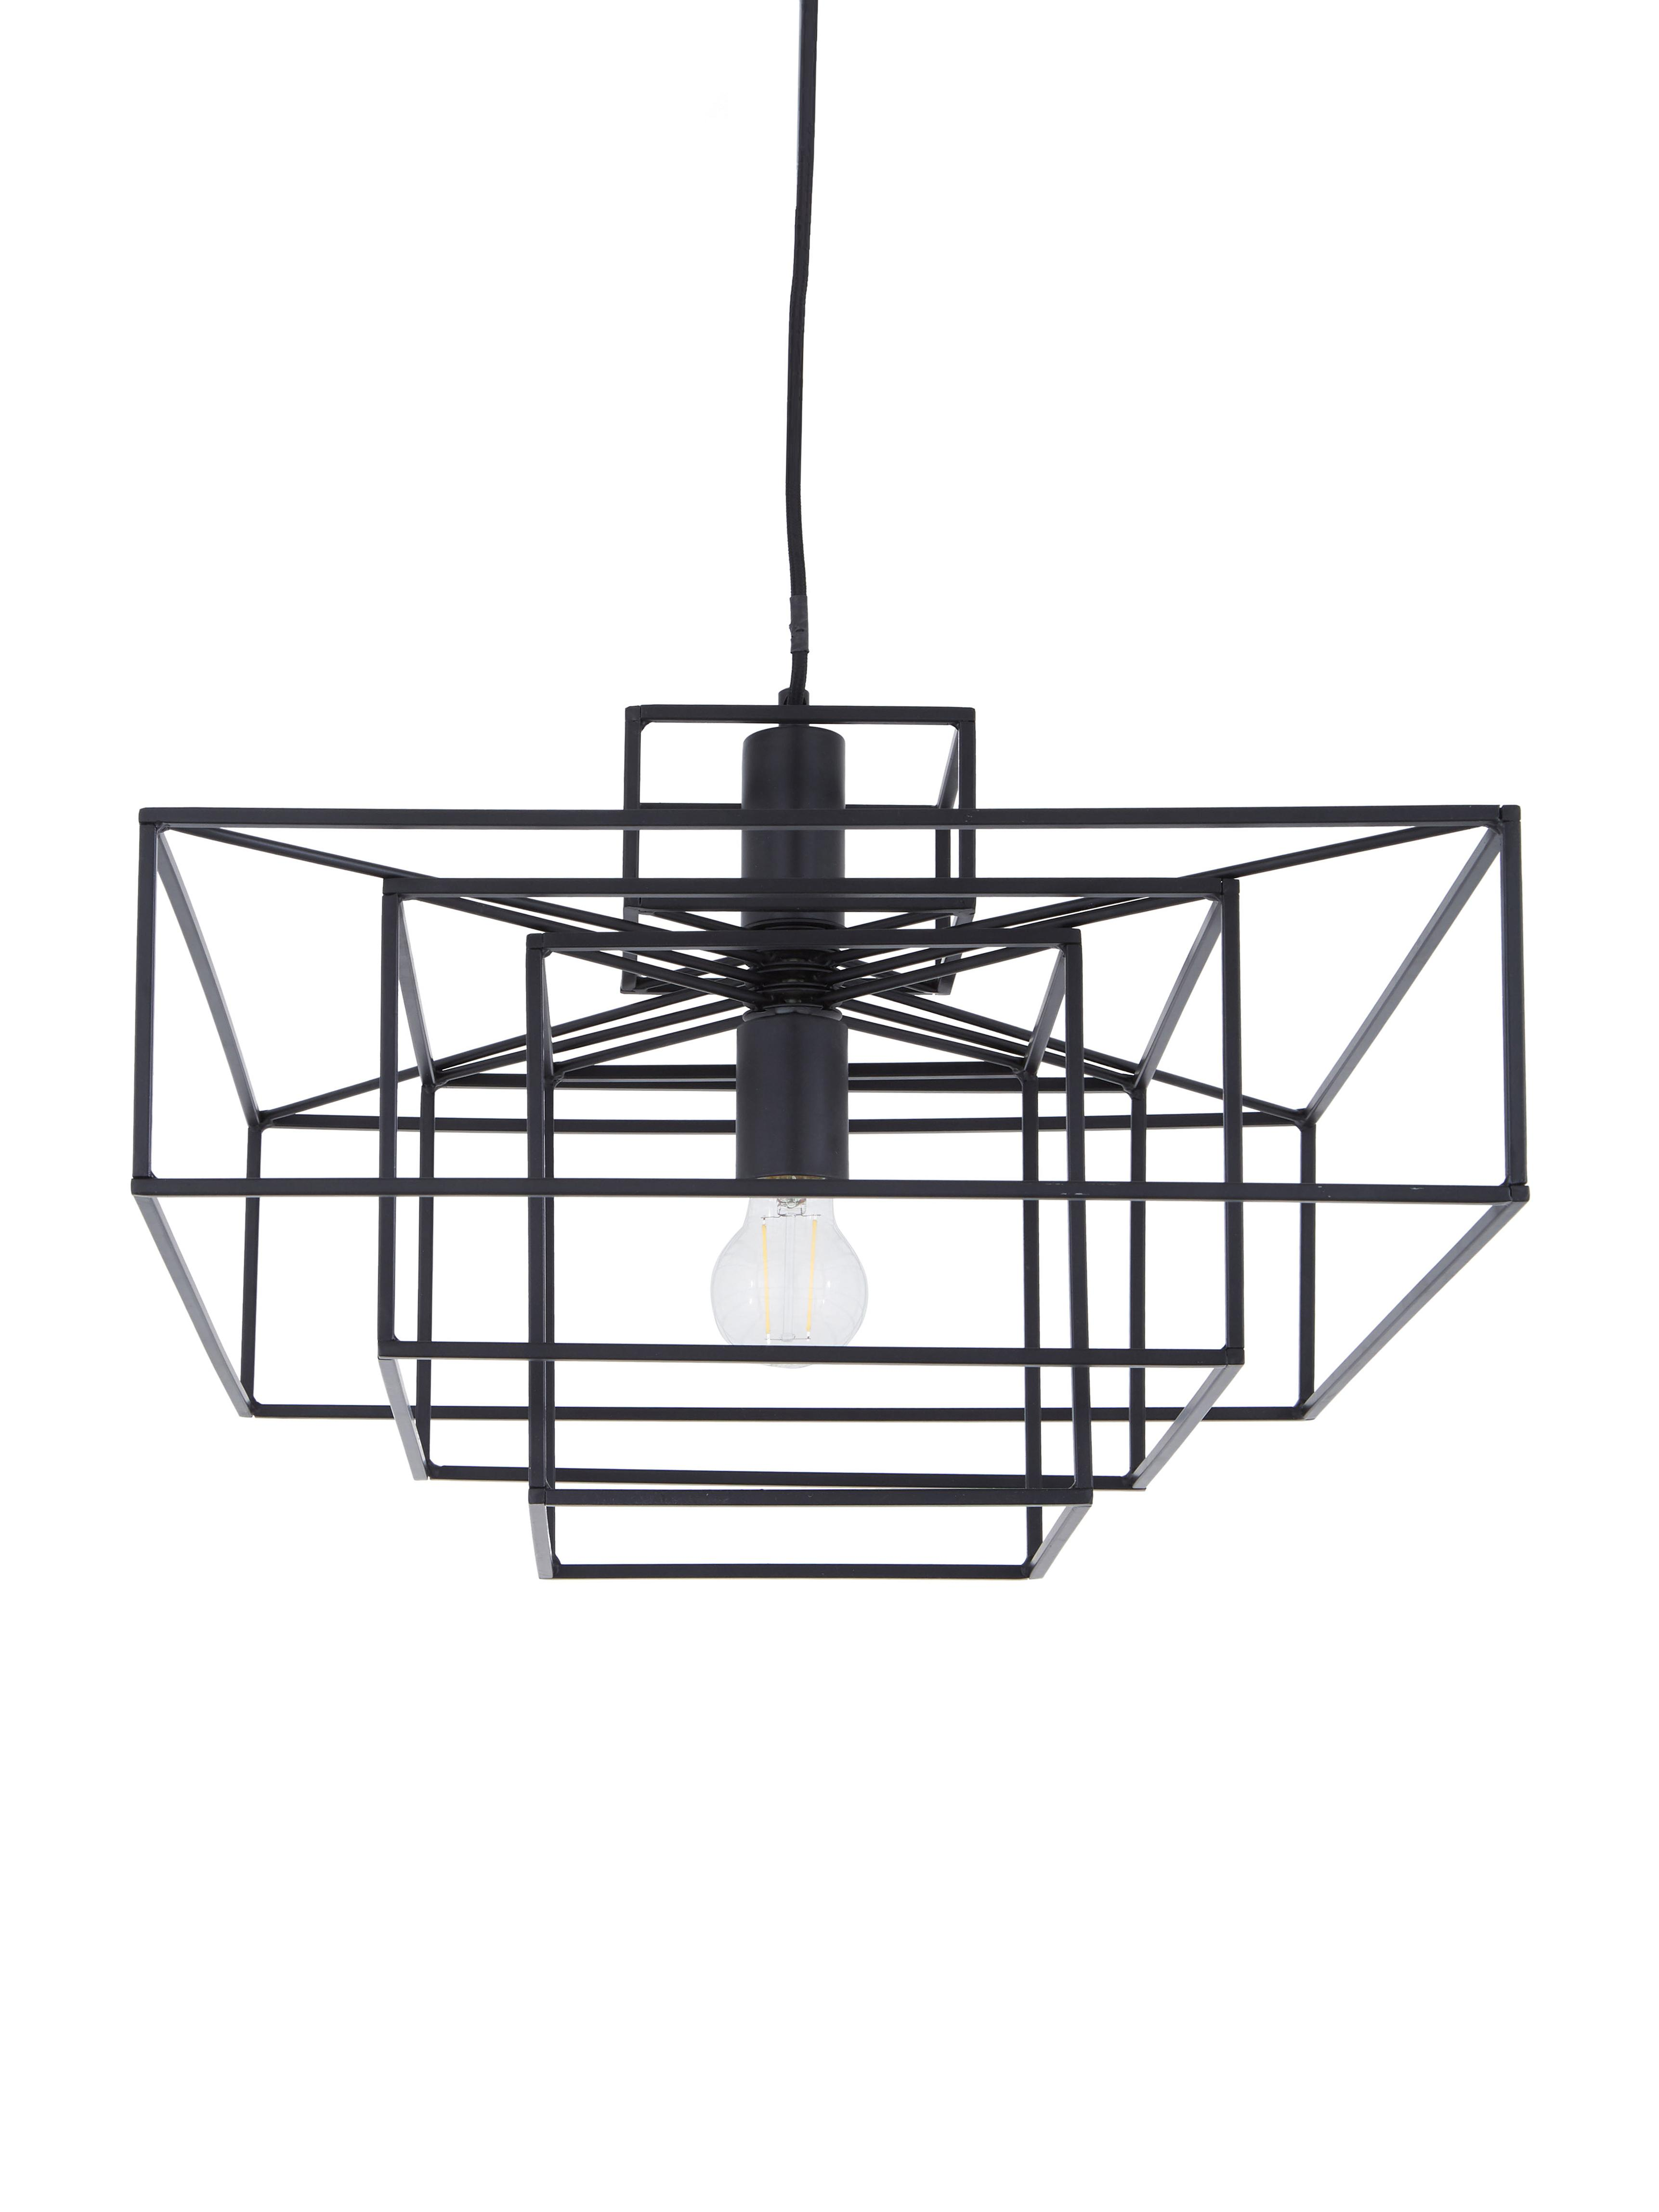 Hanglamp Cube in zwart, Gelakt metaal, Mat zwart, 46 x 50 cm